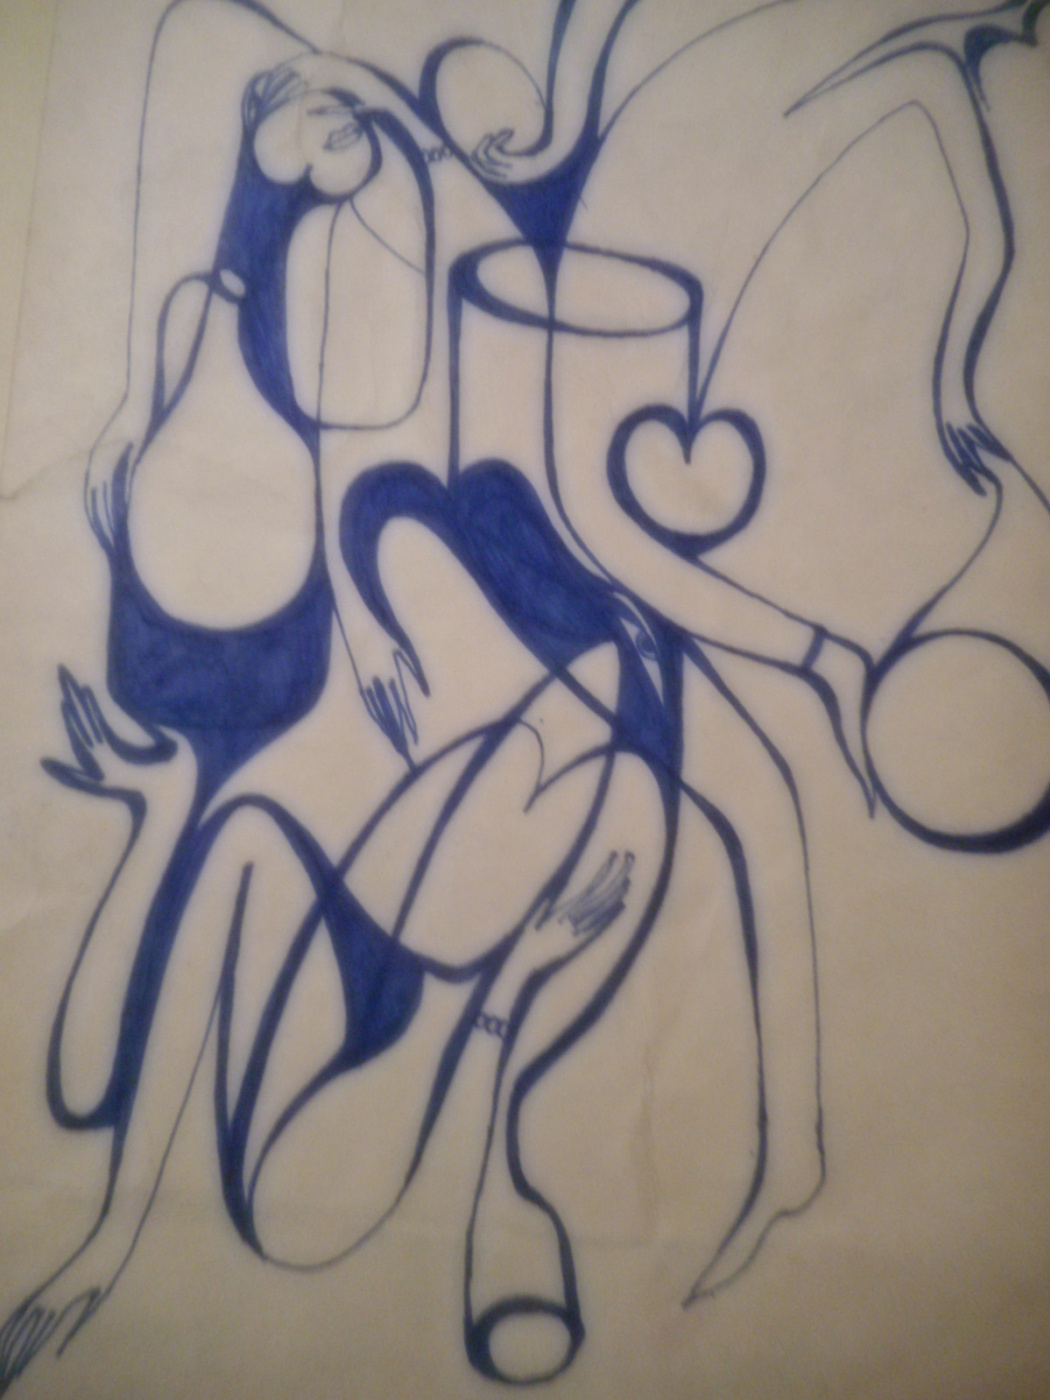 Nino Archilovna Givishvili. From the Graphic improvisation.